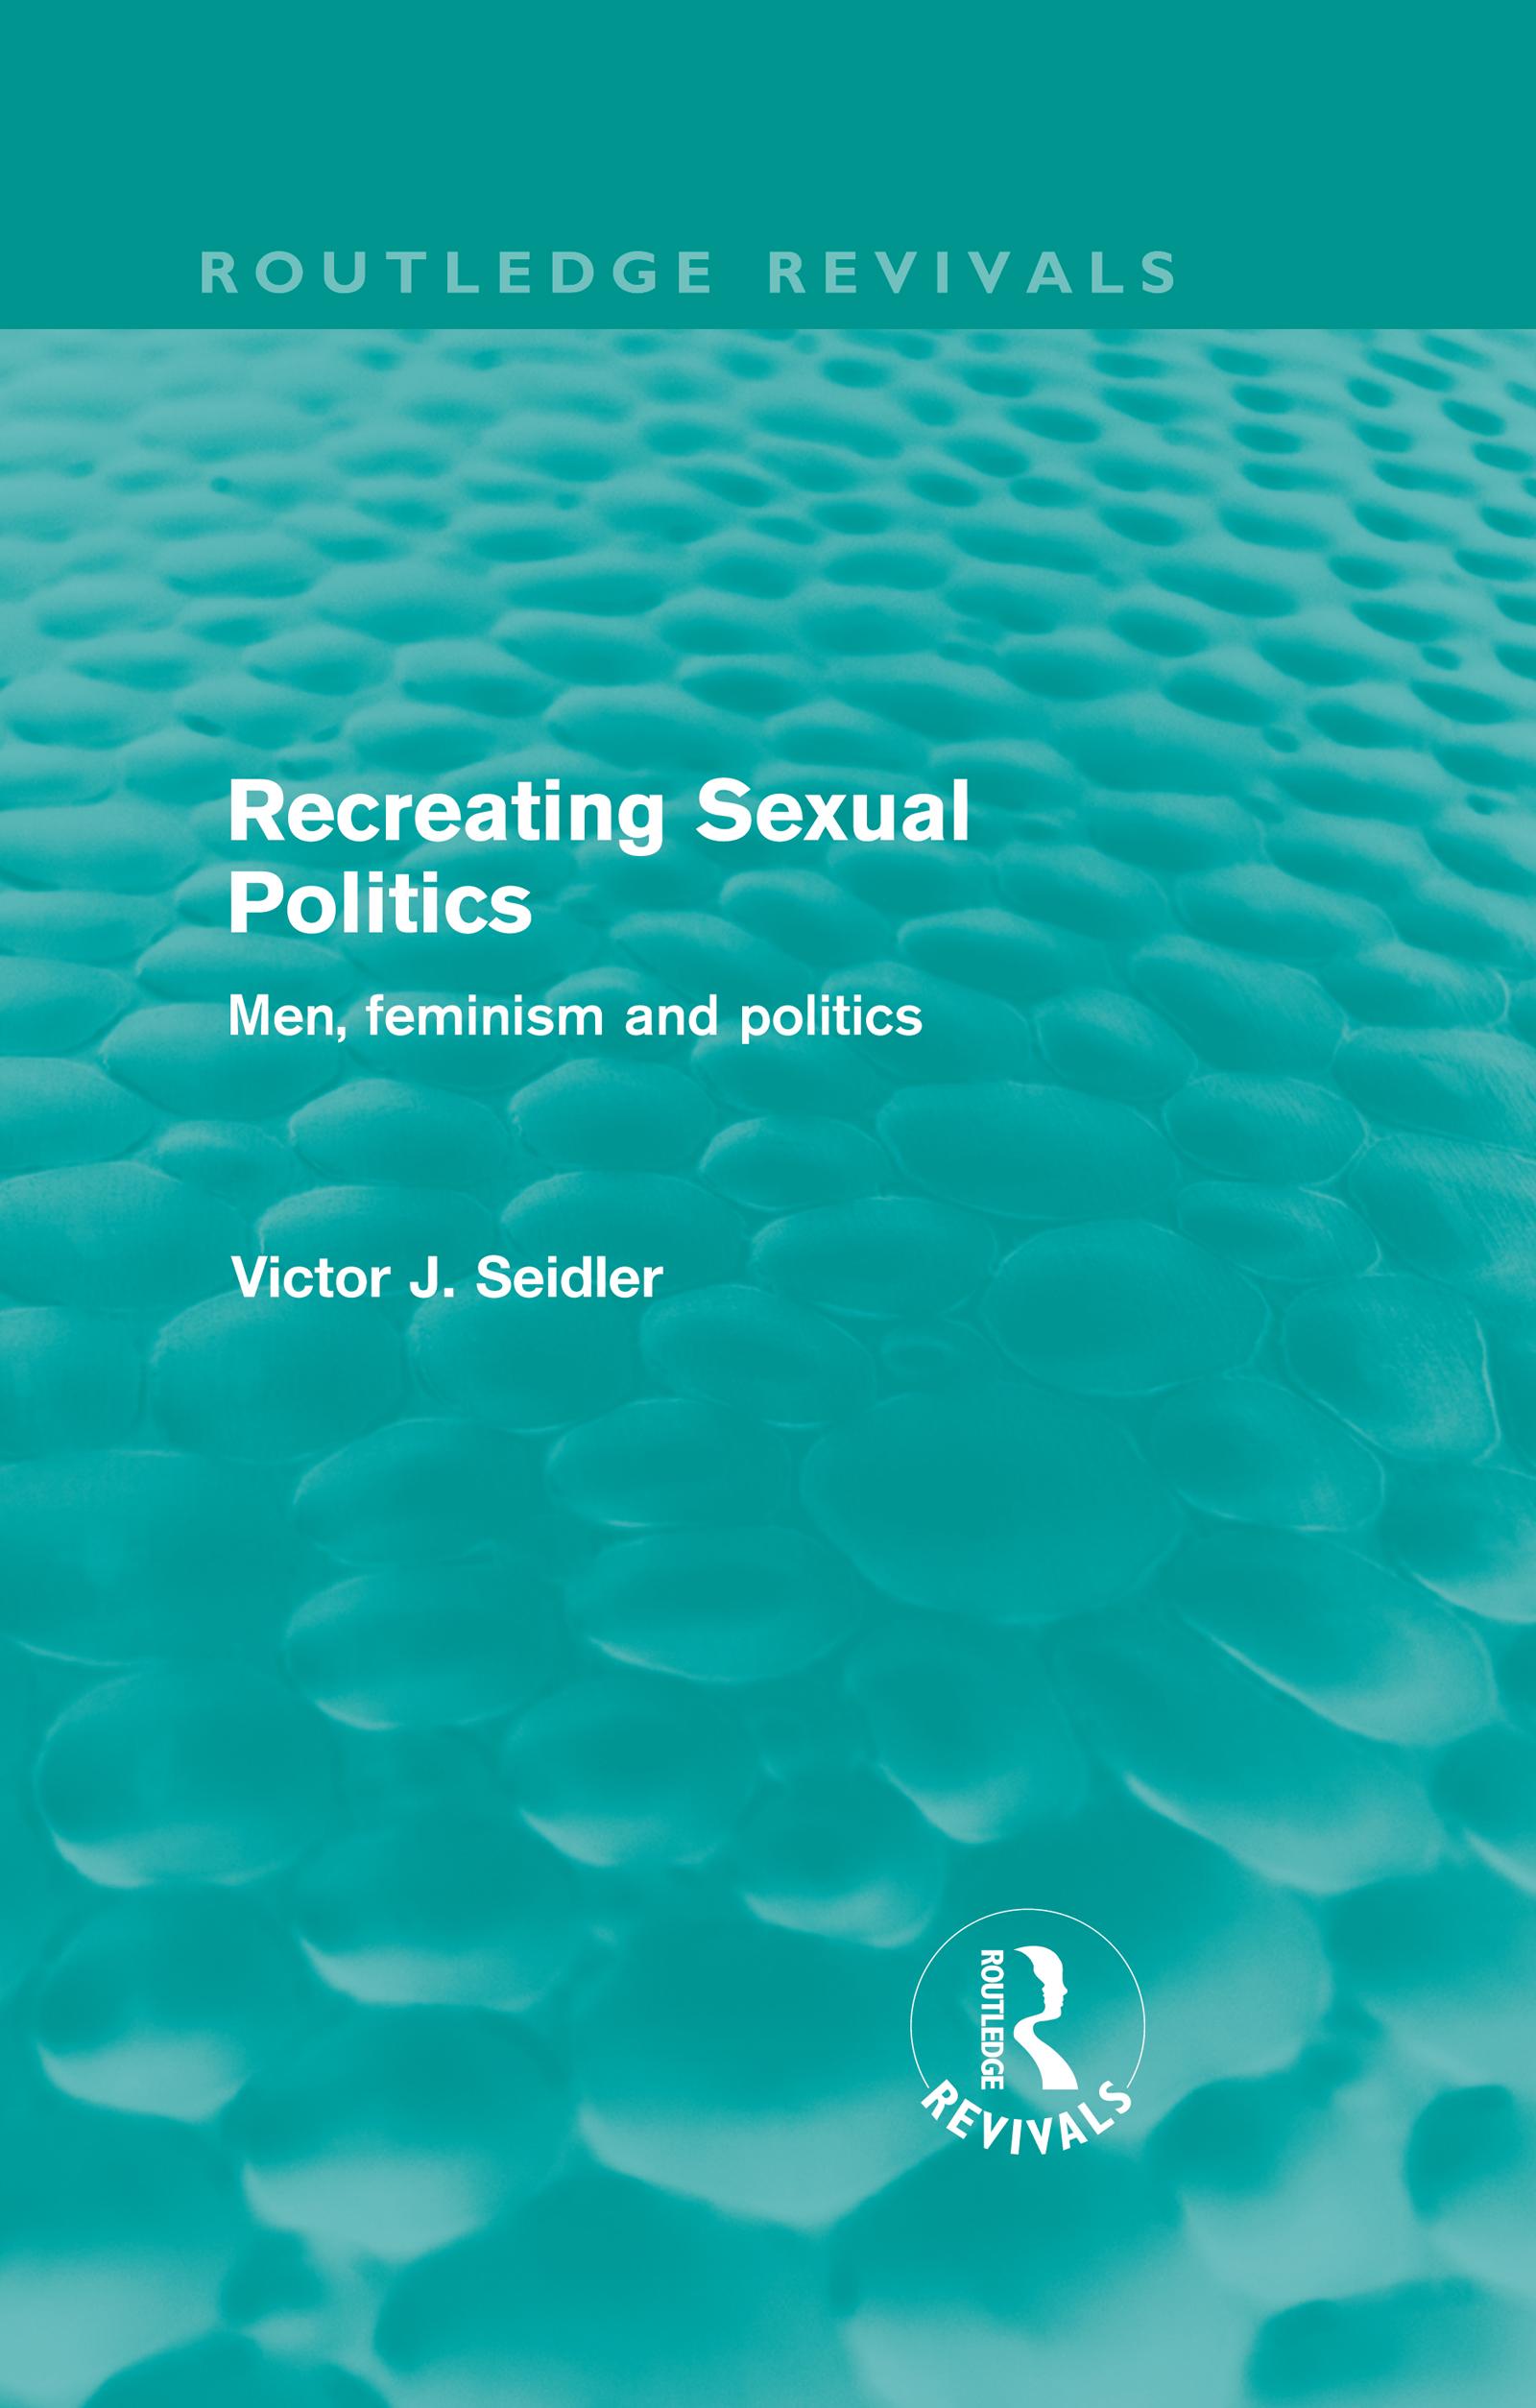 Recreating Sexual Politics (Routledge Revivals): Men, Feminism and Politics (Hardback) book cover